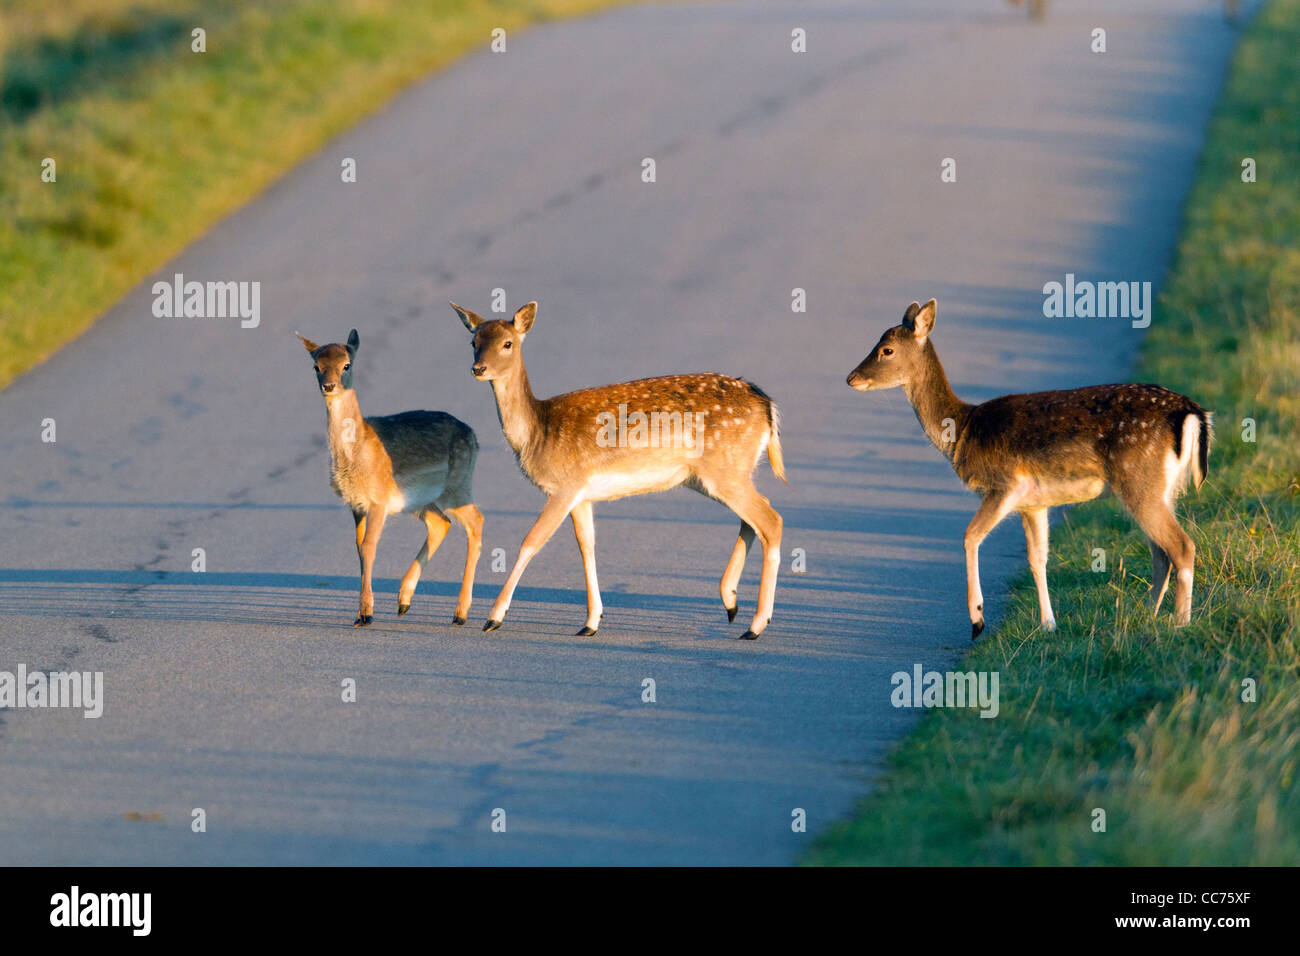 Fallow Deer (Dama dama), Three Fawns Crossing Road, Sjaelland, Denmark - Stock Image